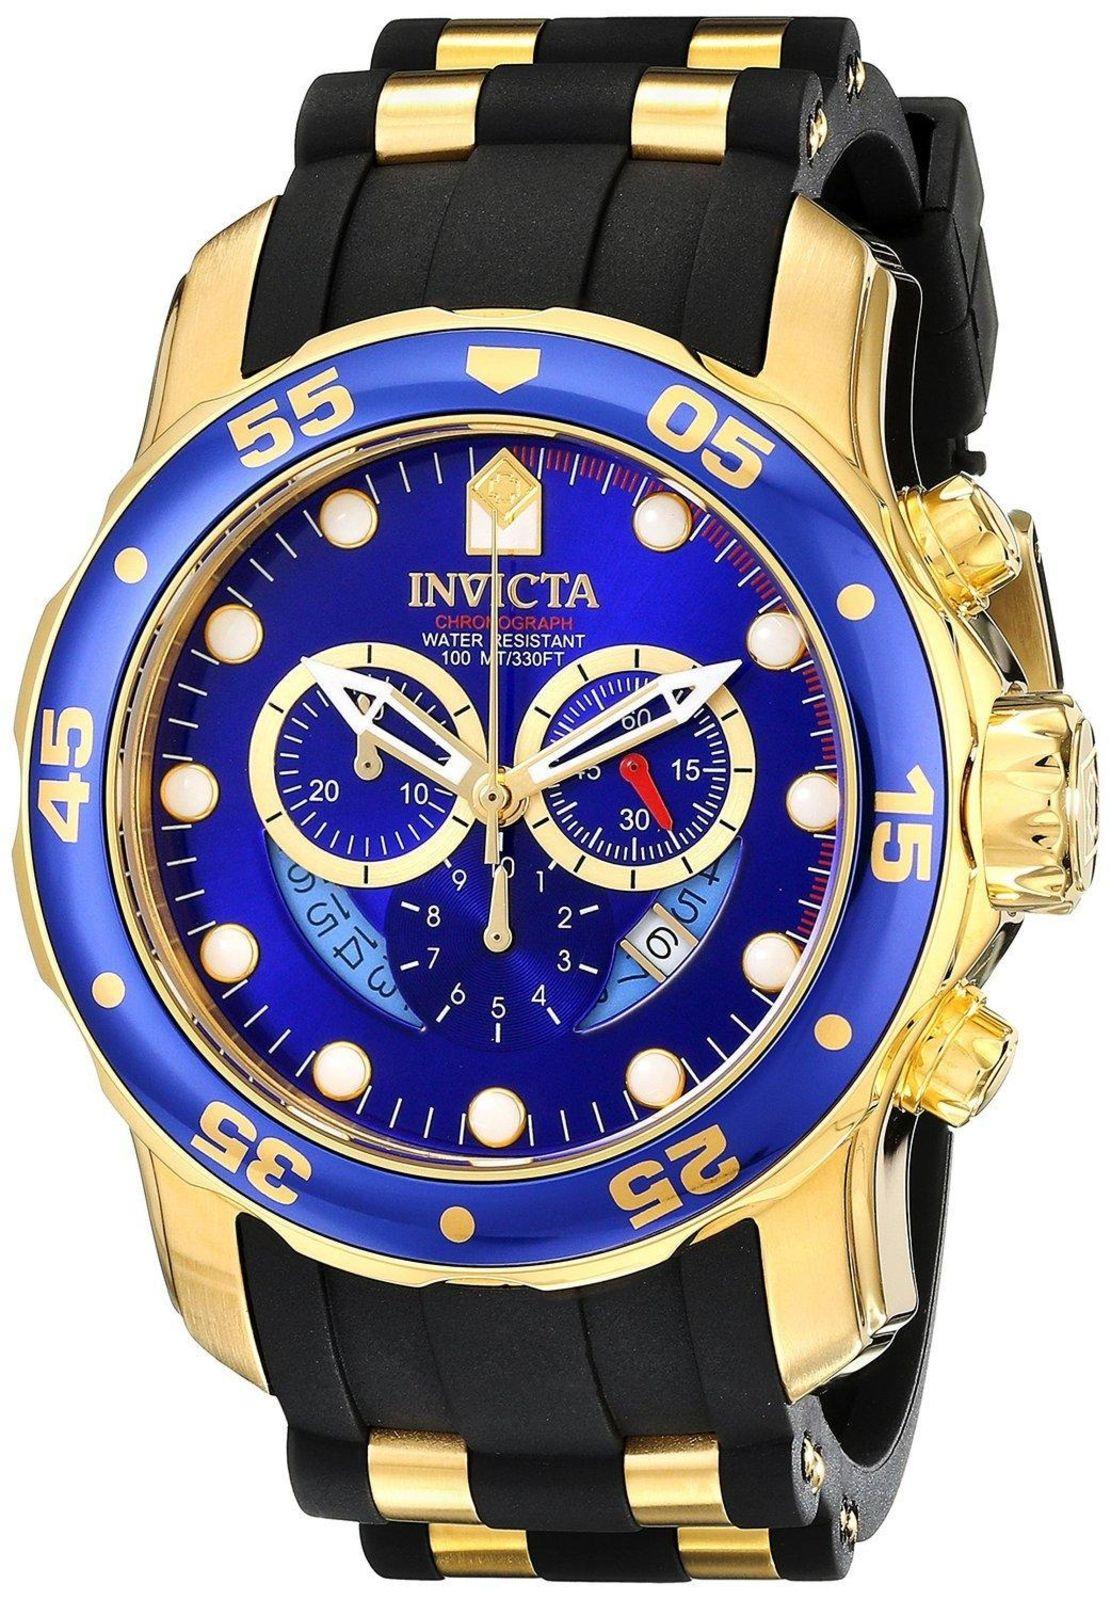 57e3b81611d Relógio Invicta Relógios 6983 Pro Diver 48 mm Cronógrafo Azul ...